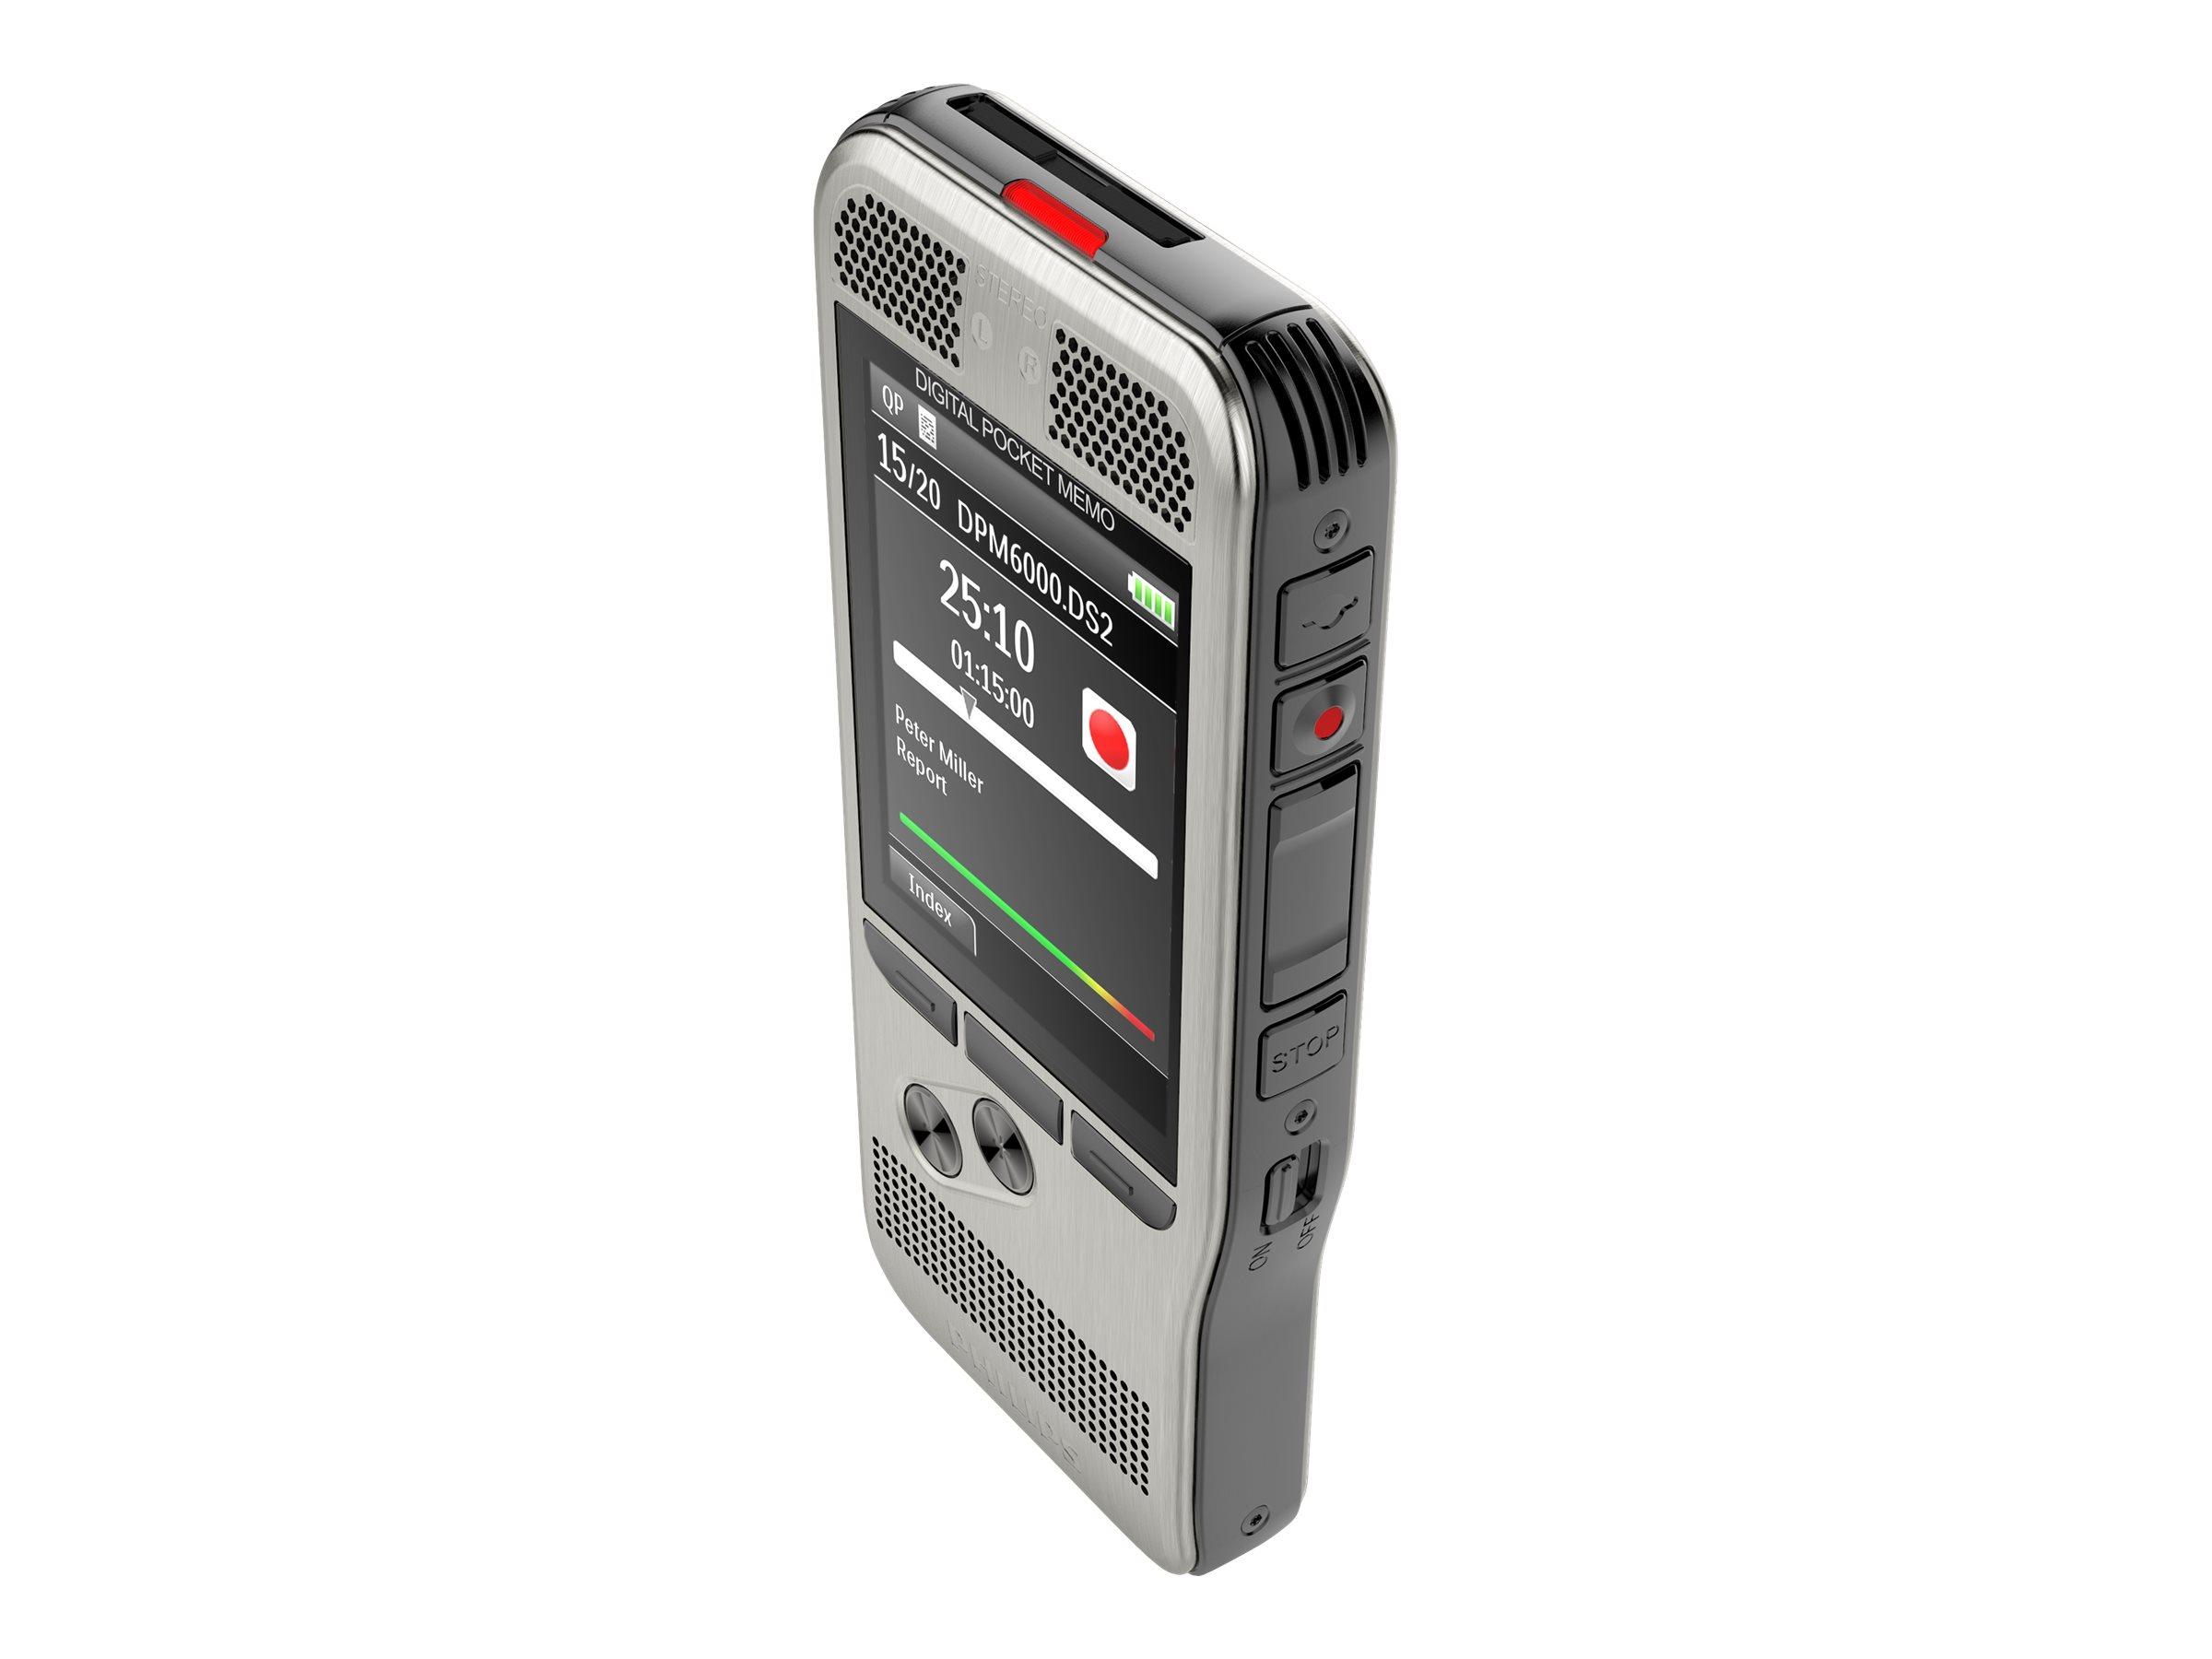 Philips Digital Pocket Memo DPM6000 - Voicerecorder